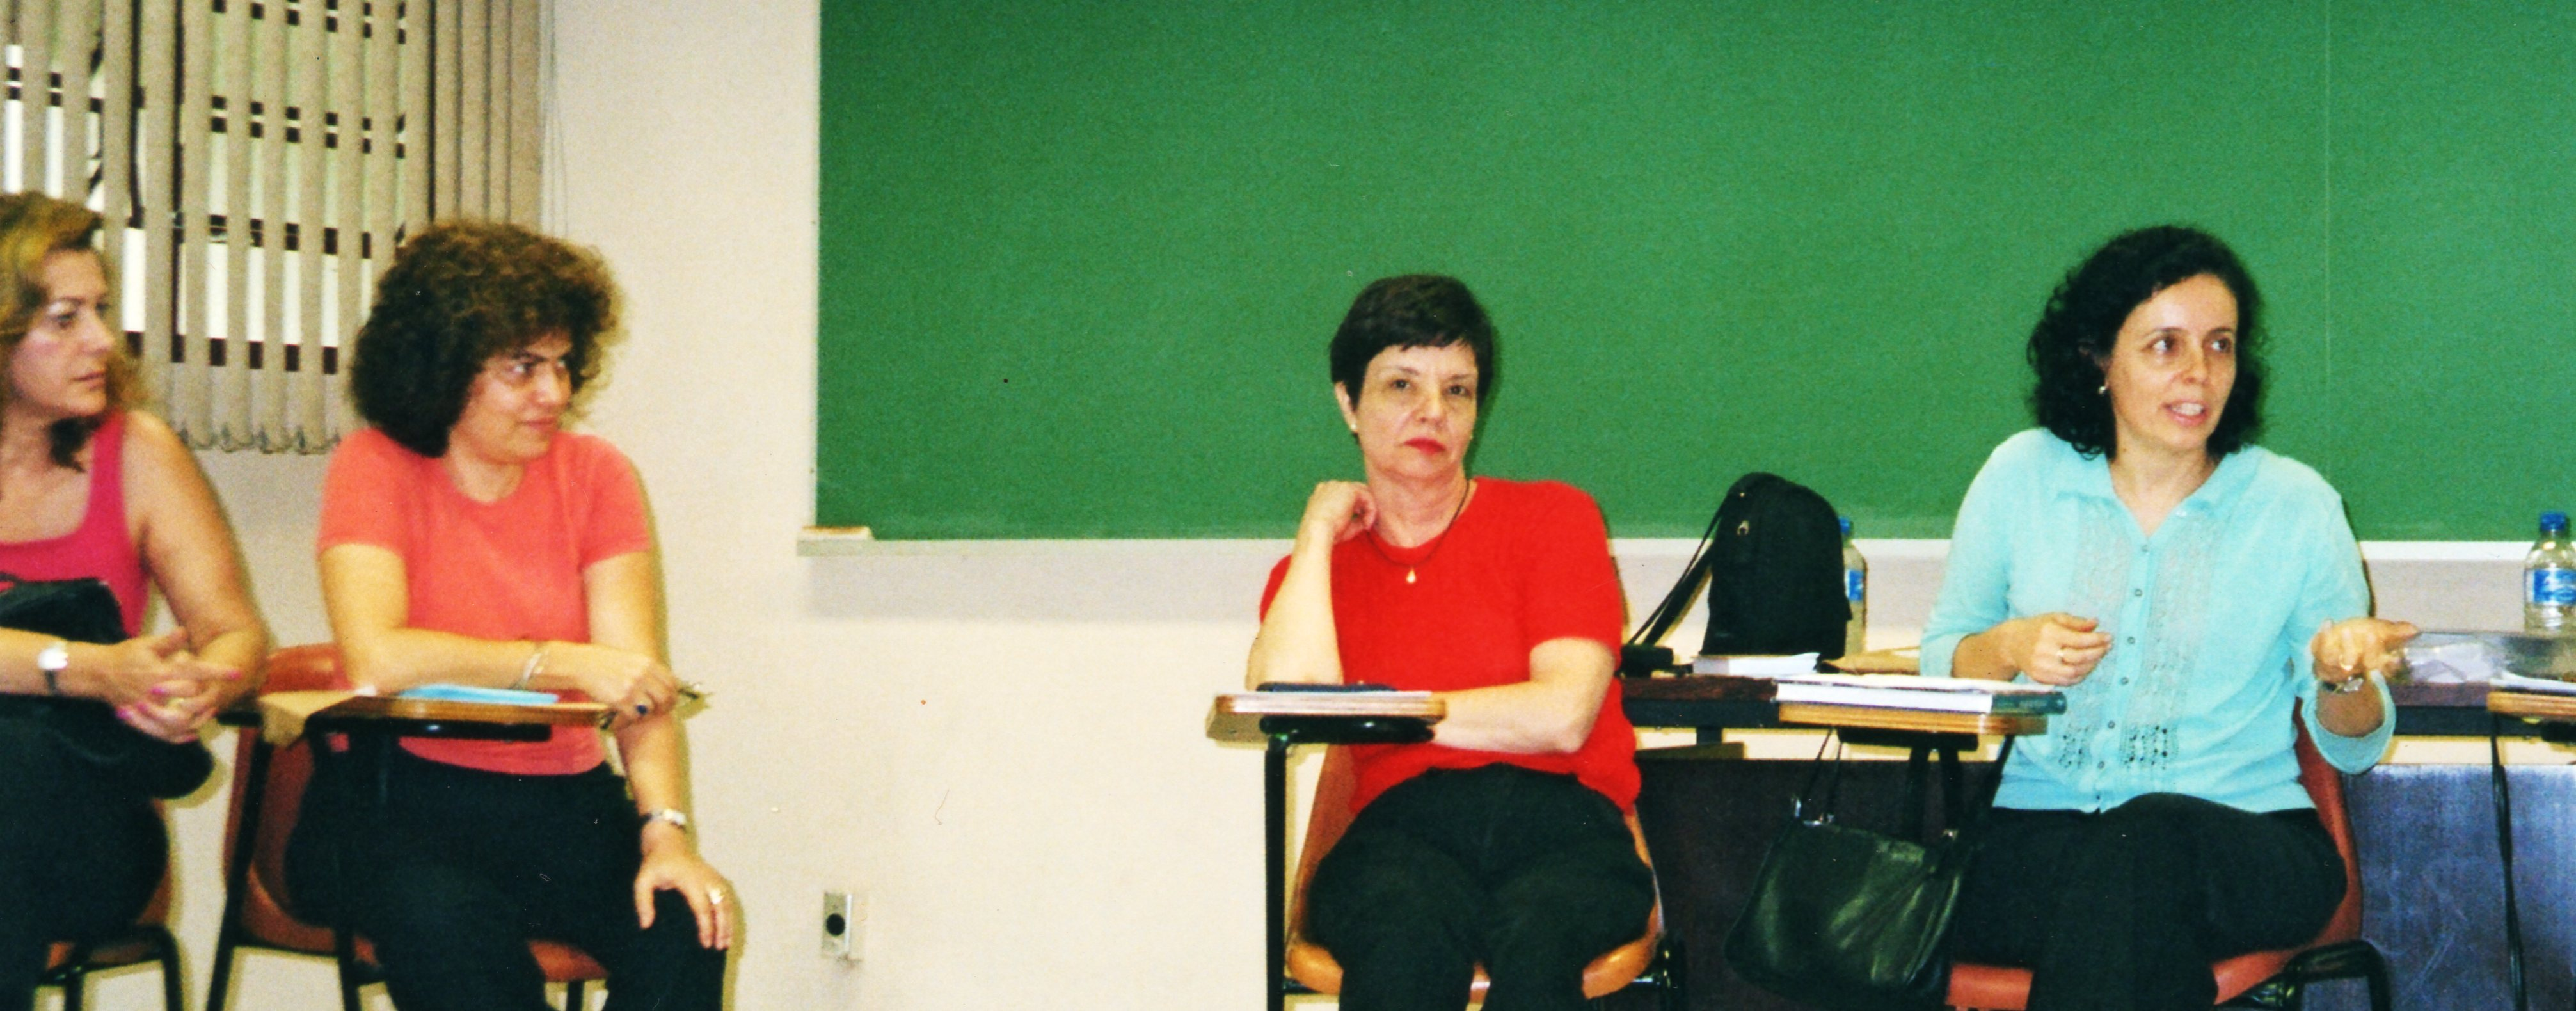 Laboratório Saúde Mental e Psicologia Clínica Social 20 anos 028